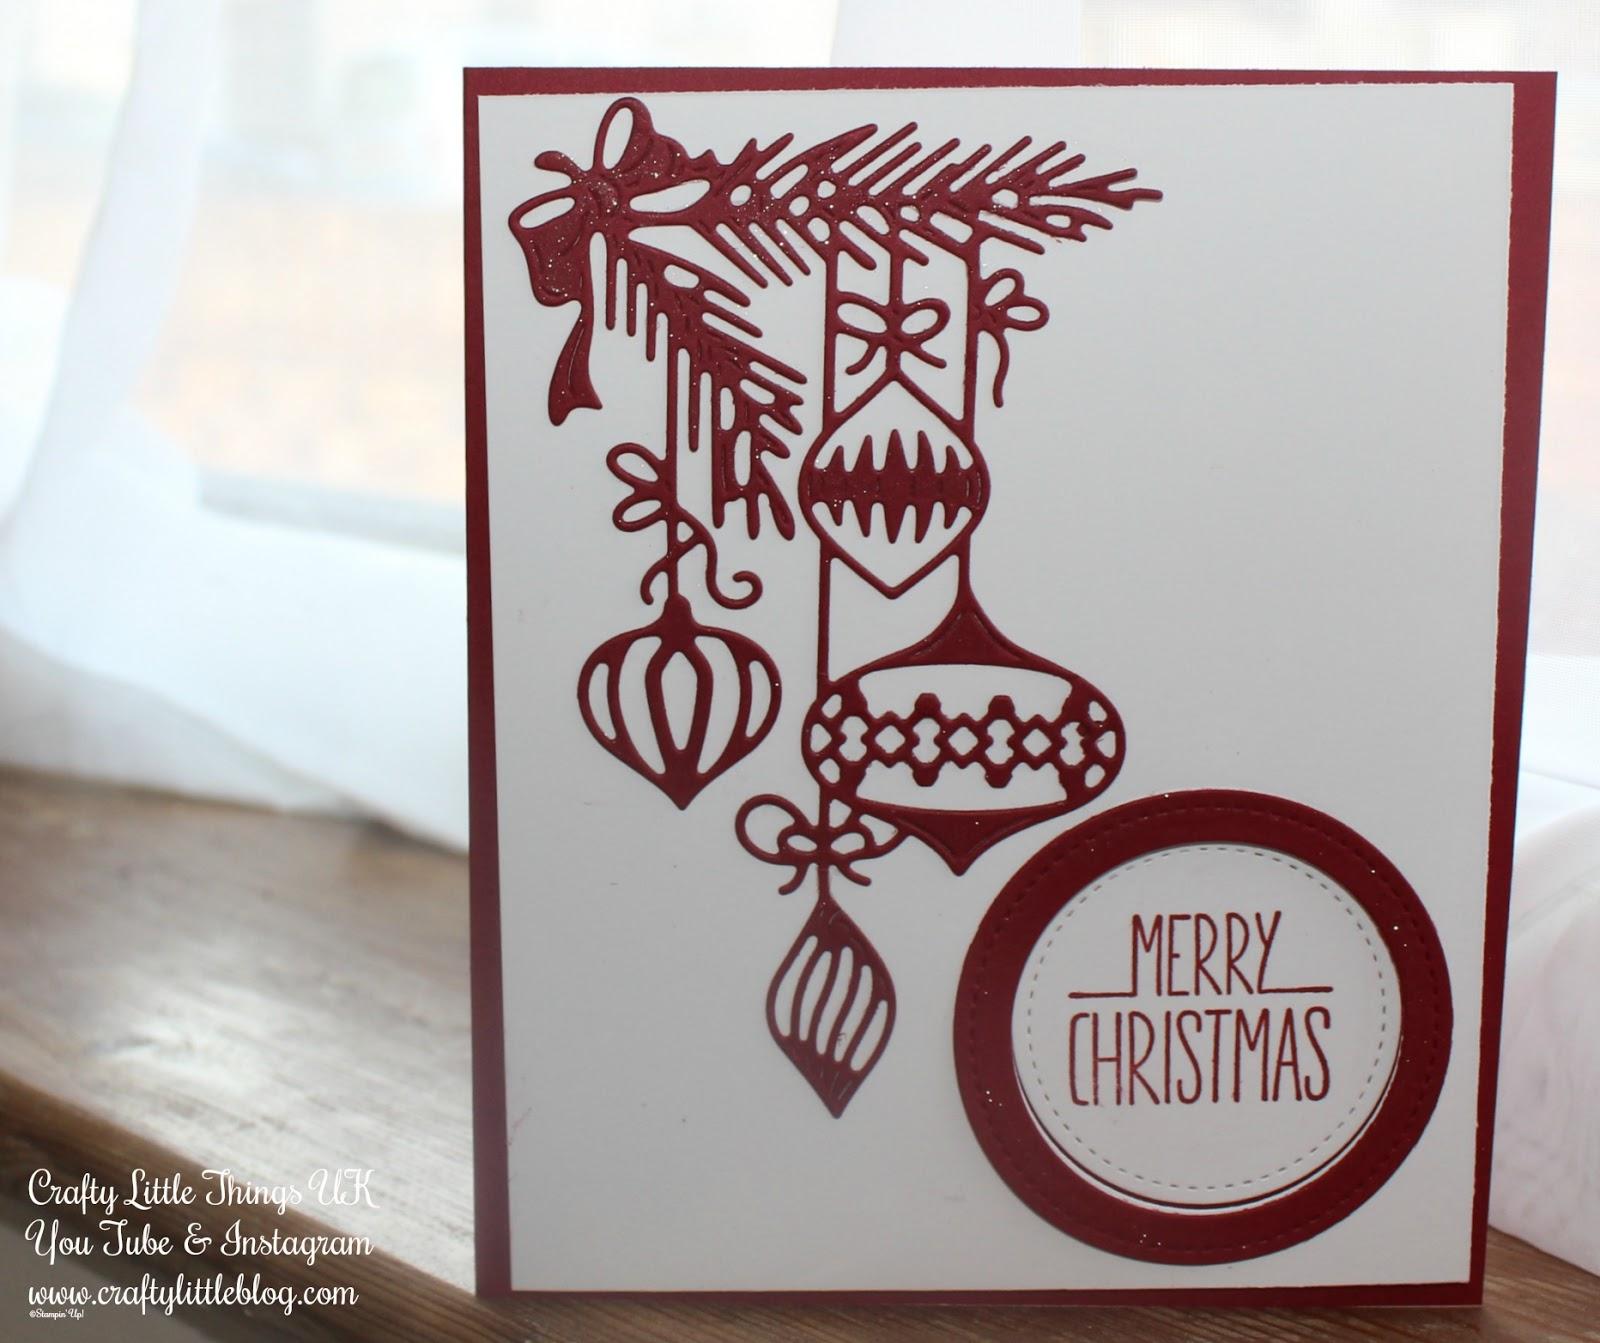 Crafty Little Blog: Christmas Card Number 8